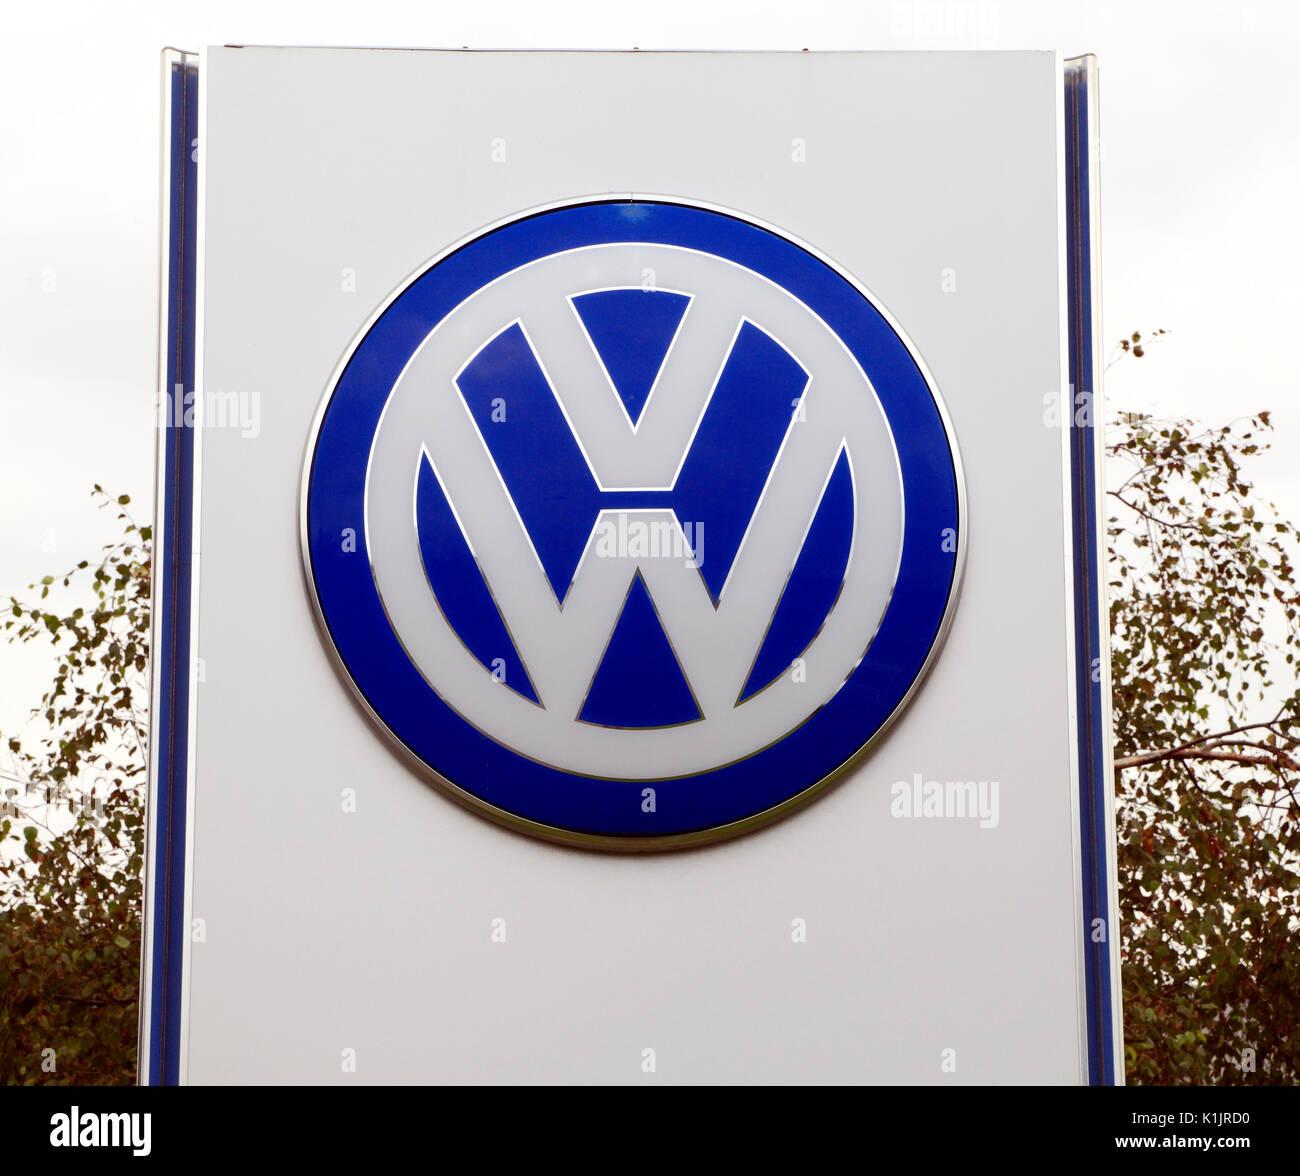 VW logo, Volkswagen, Motor Cars, vehicles, main dealer, dealership, England, UK - Stock Image